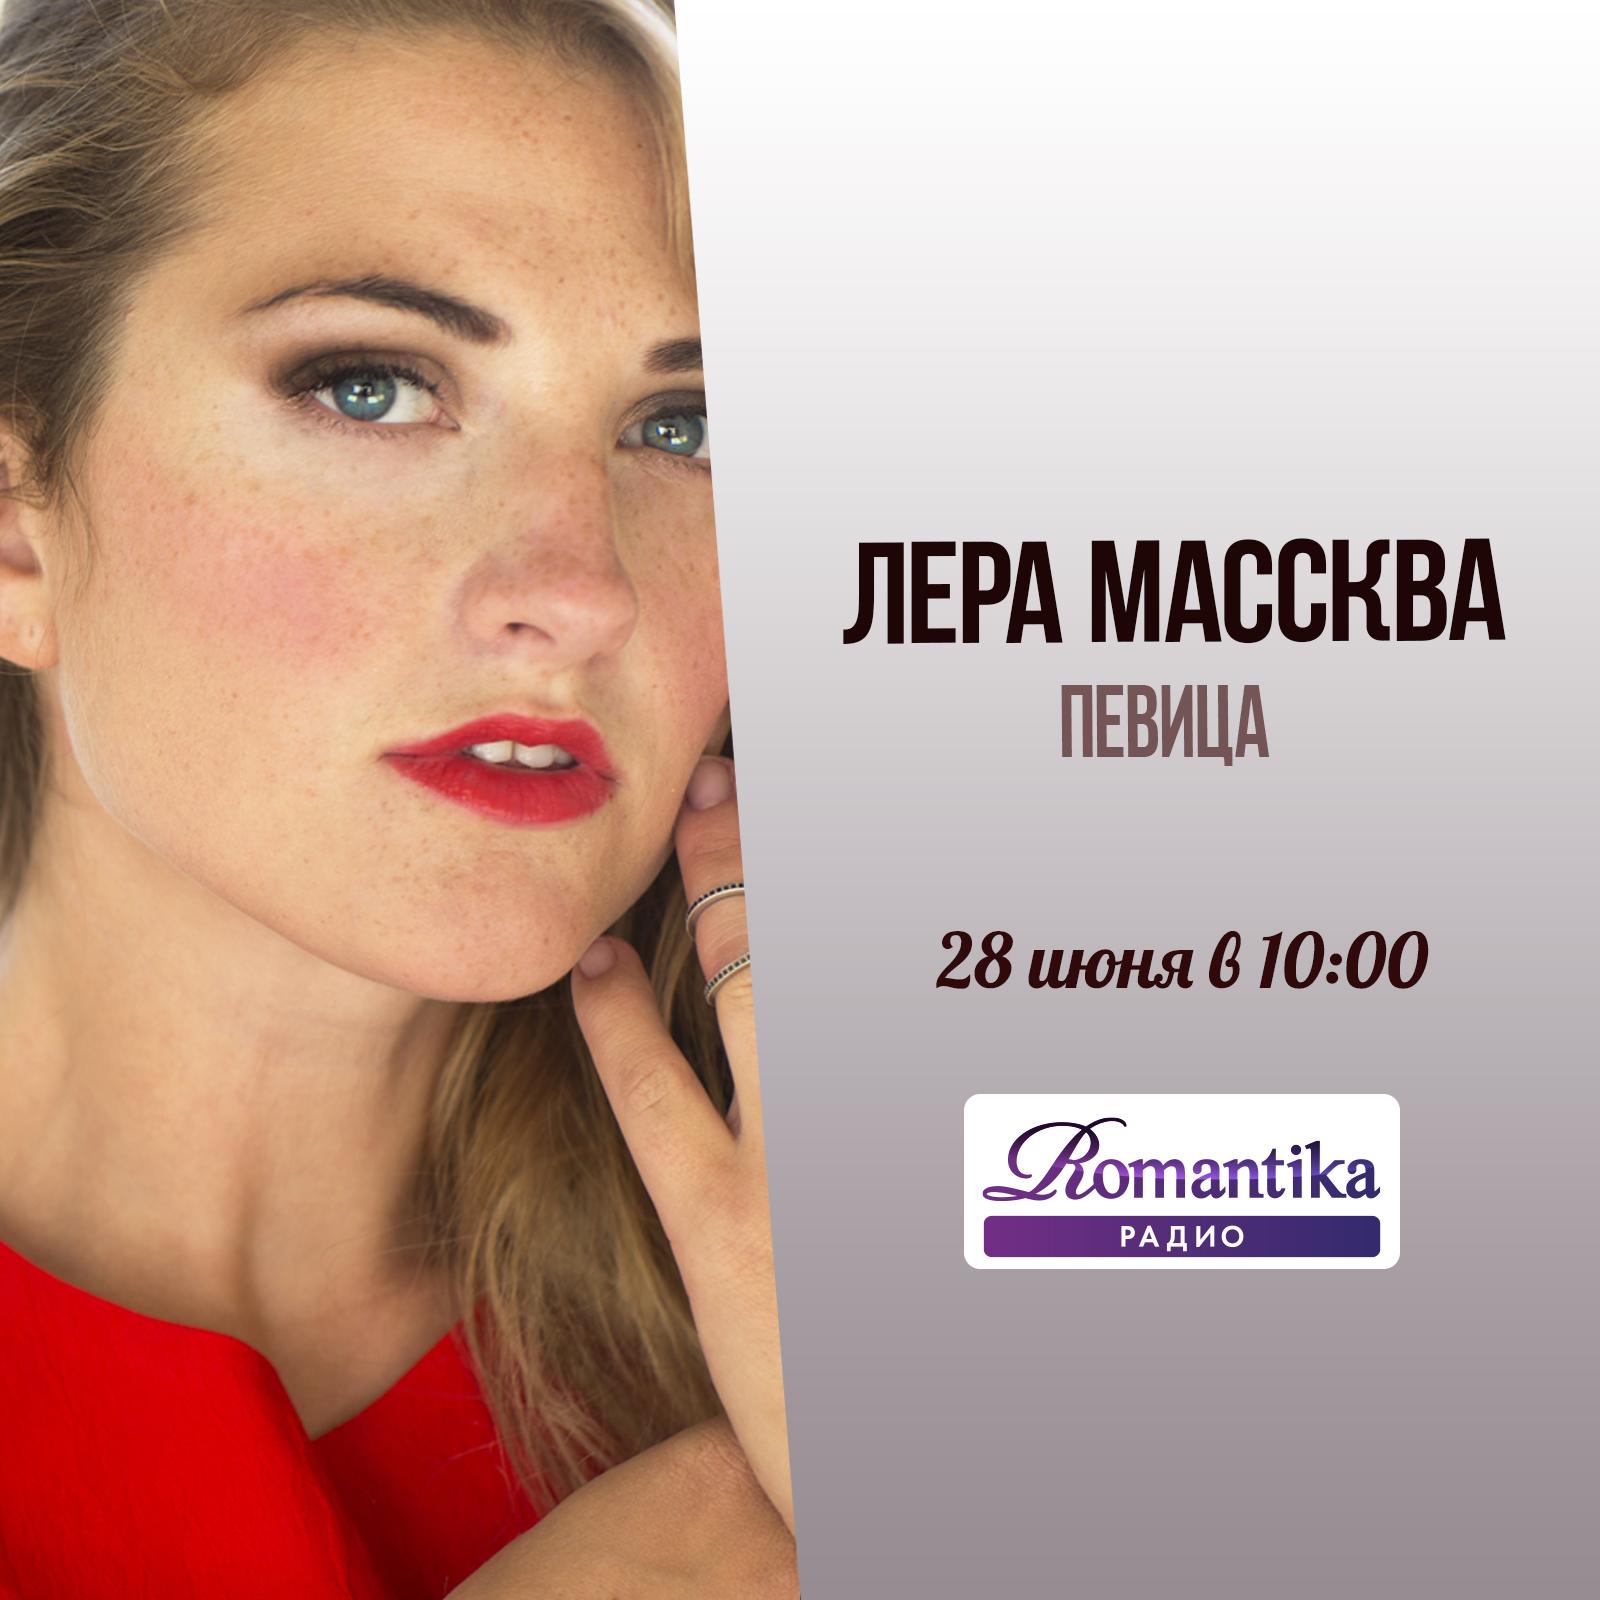 Утро на радио Romantika: 28 июня – в гостях певица Лера Массква - Радио Romantika